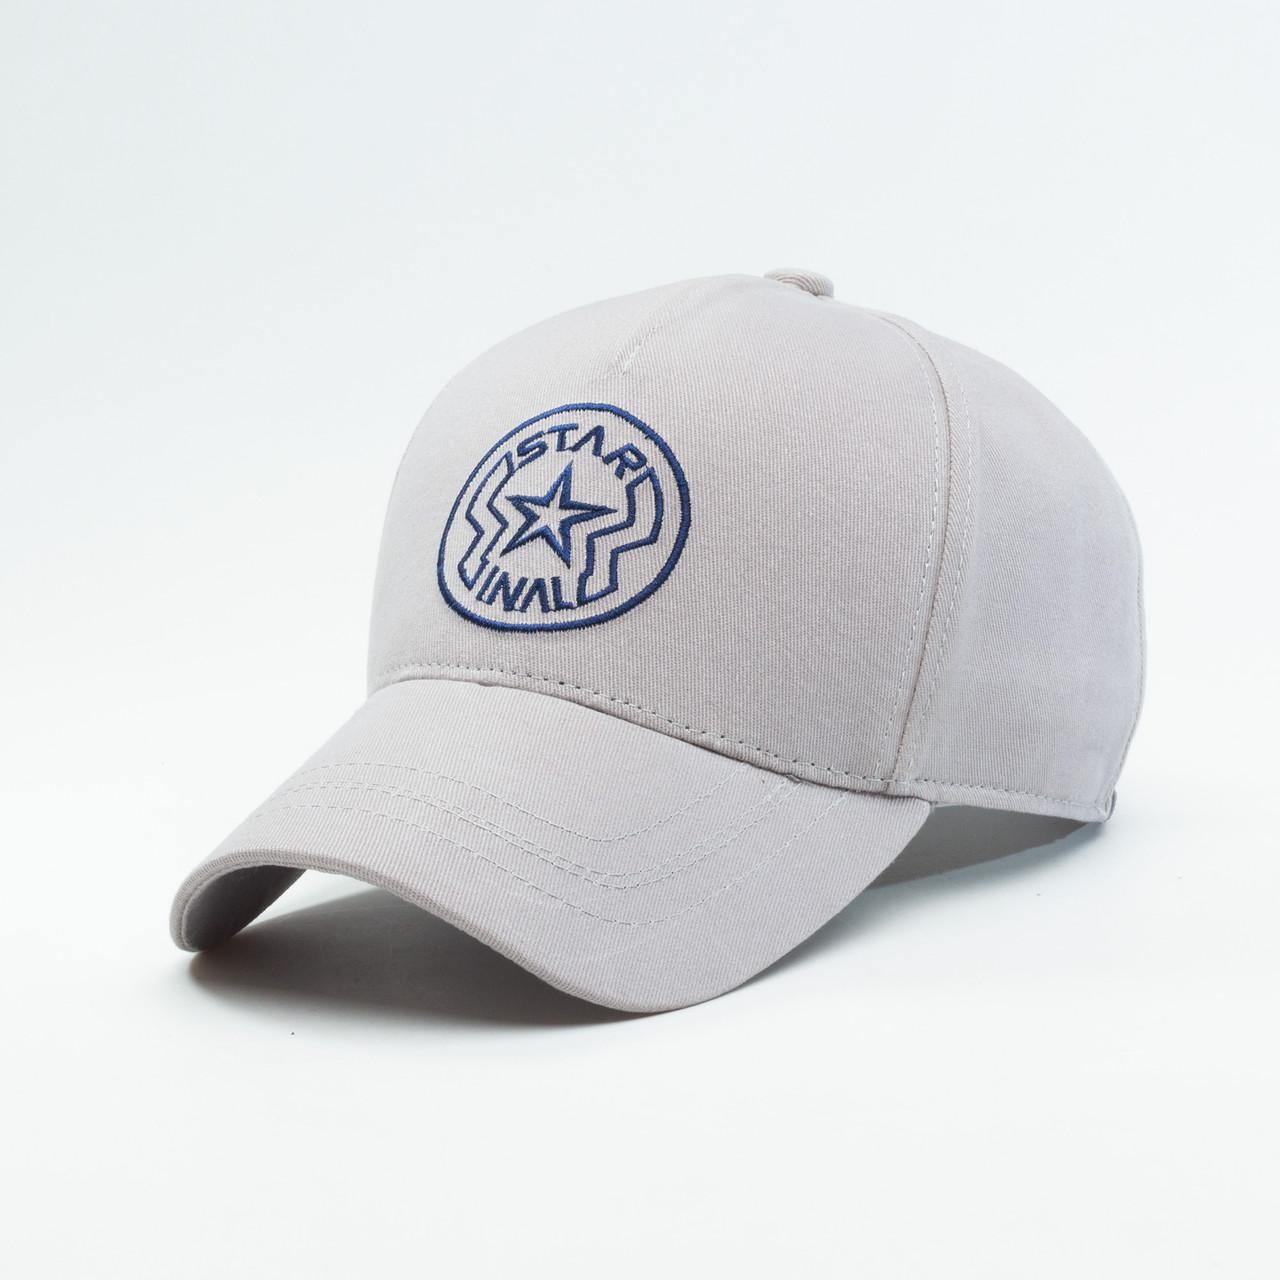 Детская кепка бейсболка INAL star XS / 51-52 RU Серый 239551